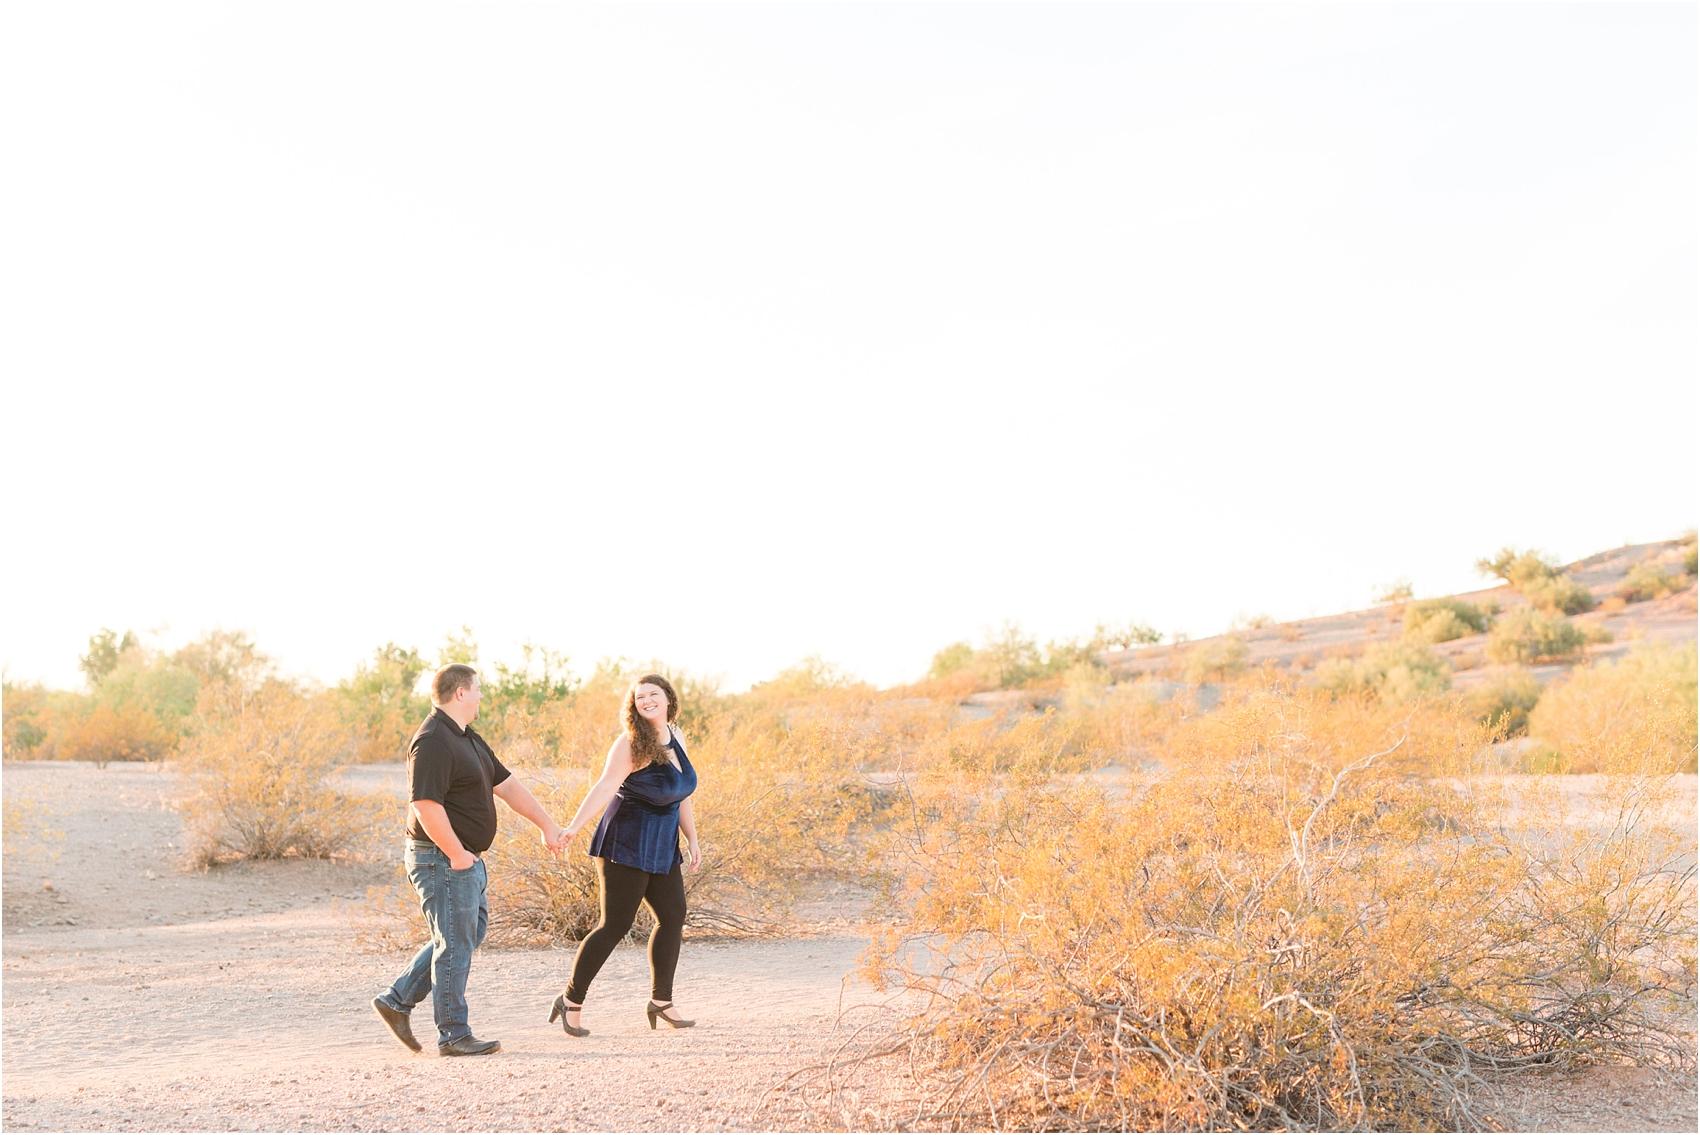 romantic-desert-engagement-photos-in-scottsdale-arizona-courtney-carolyn-photography-by-katelyn-james_0038.jpg